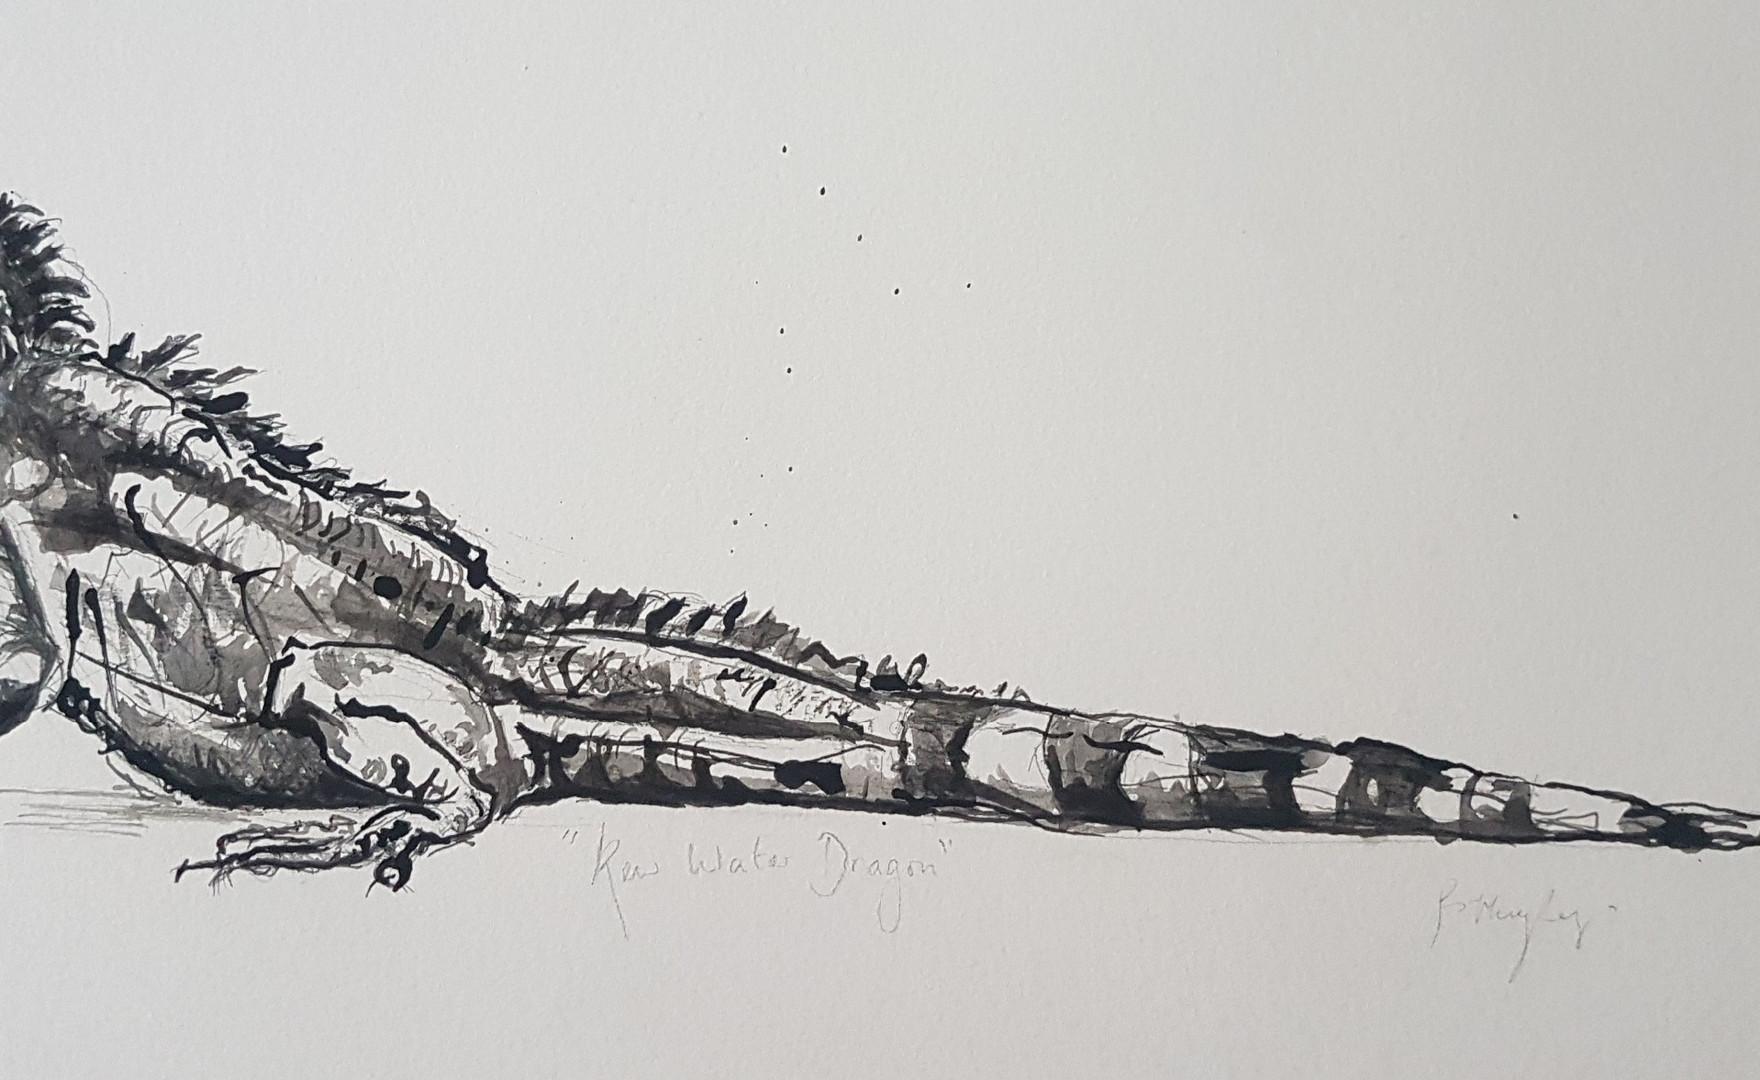 Kew Water Dragon